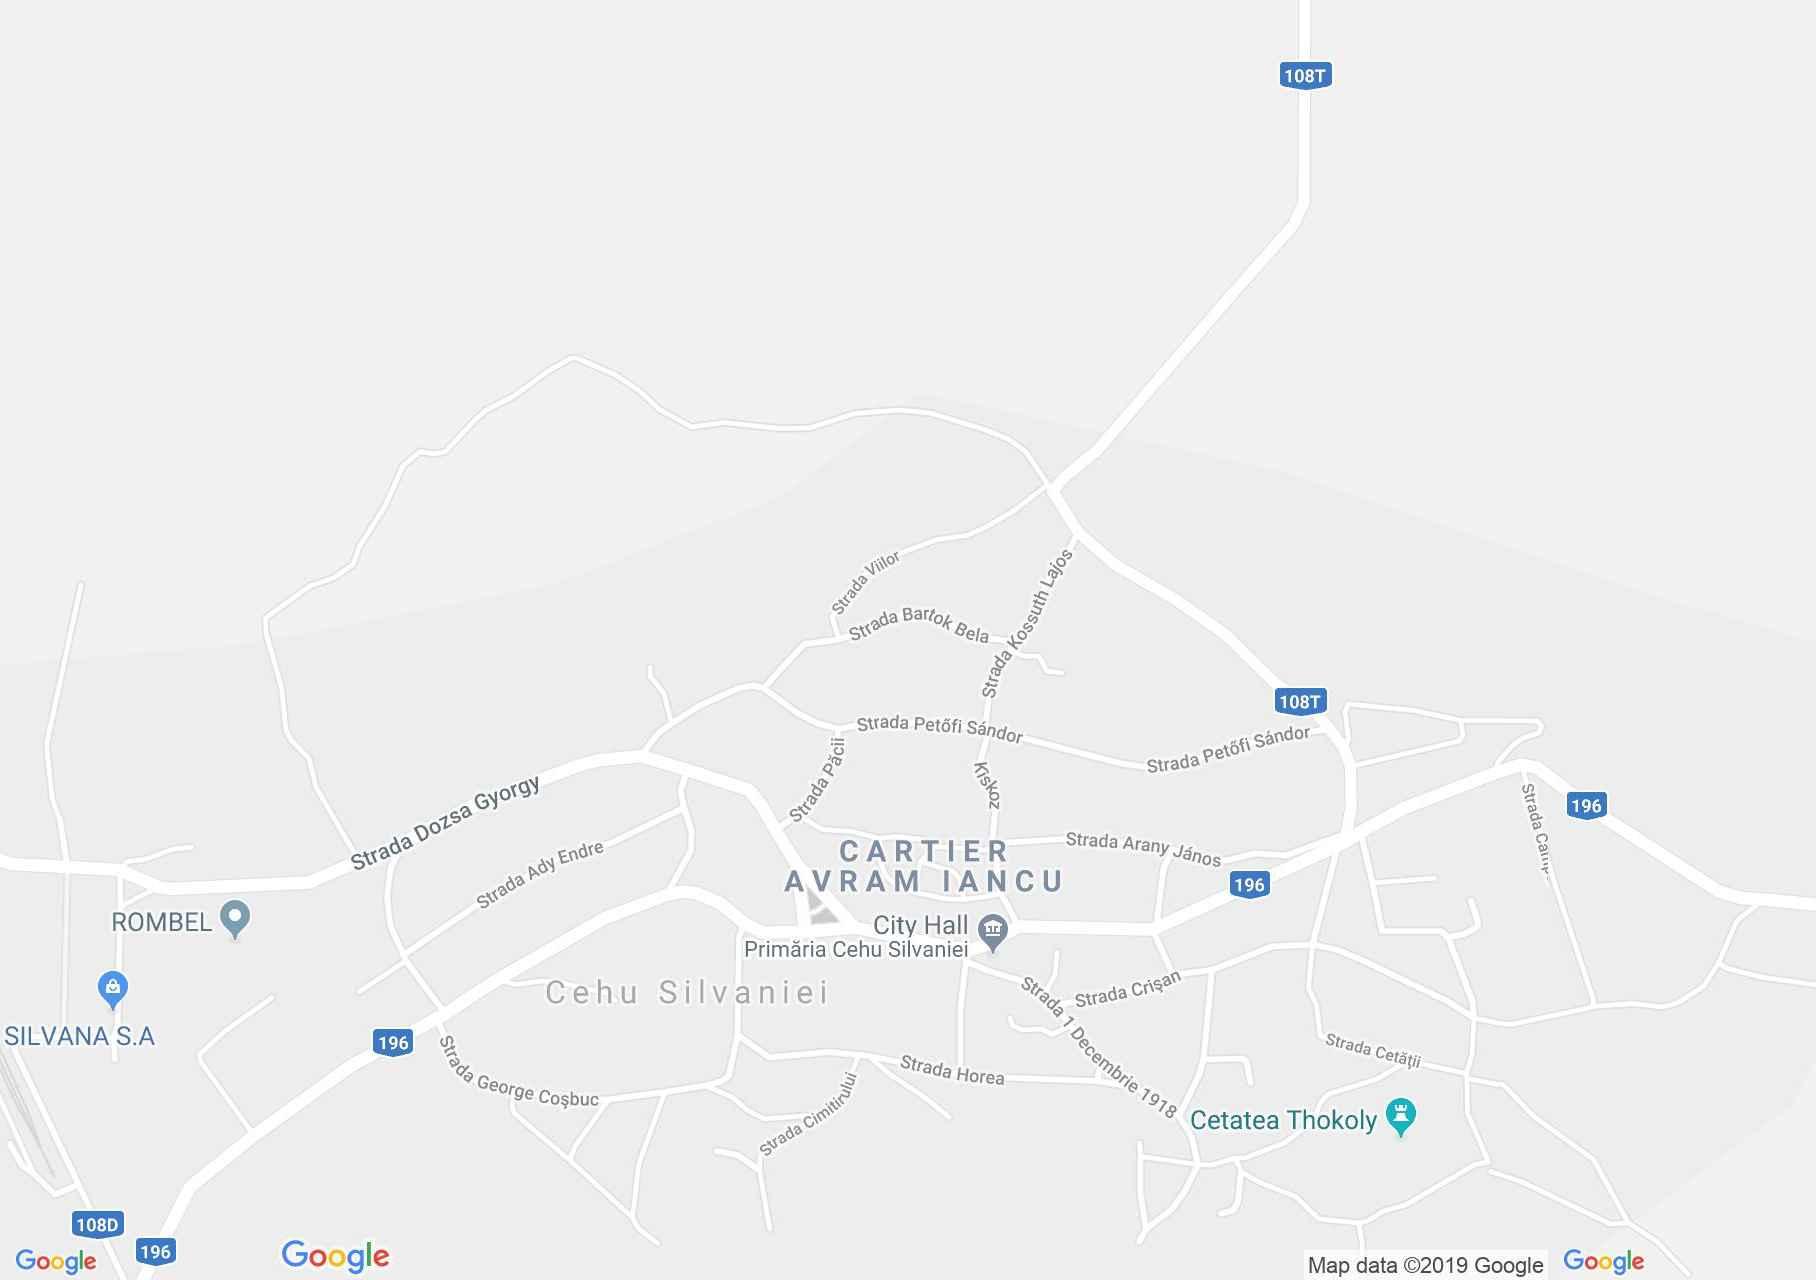 Map of Cehu Silvaniei: Catholic church